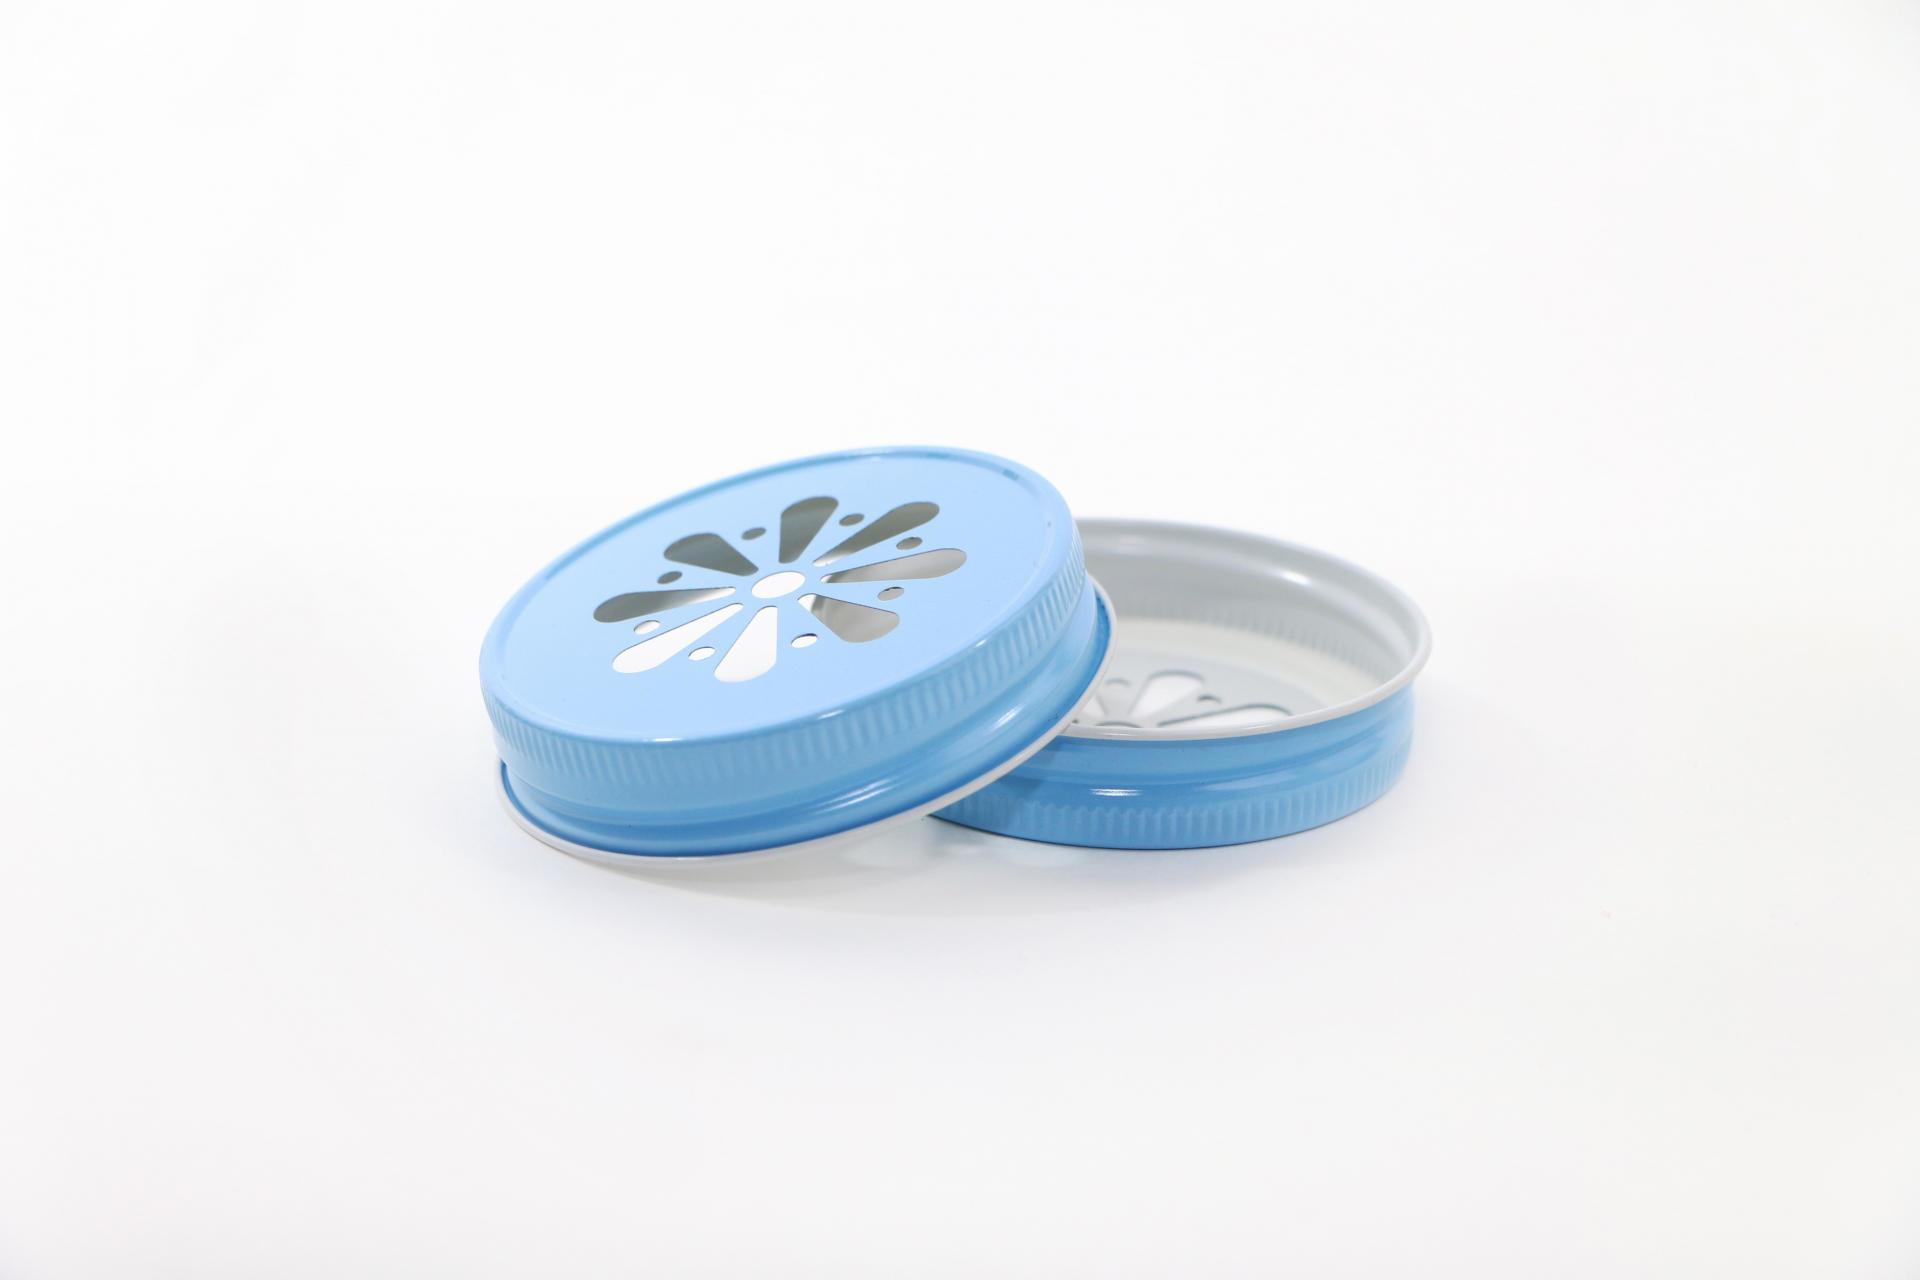 Ball Dekorativní kovové víčko Ball modré, modrá barva, kov